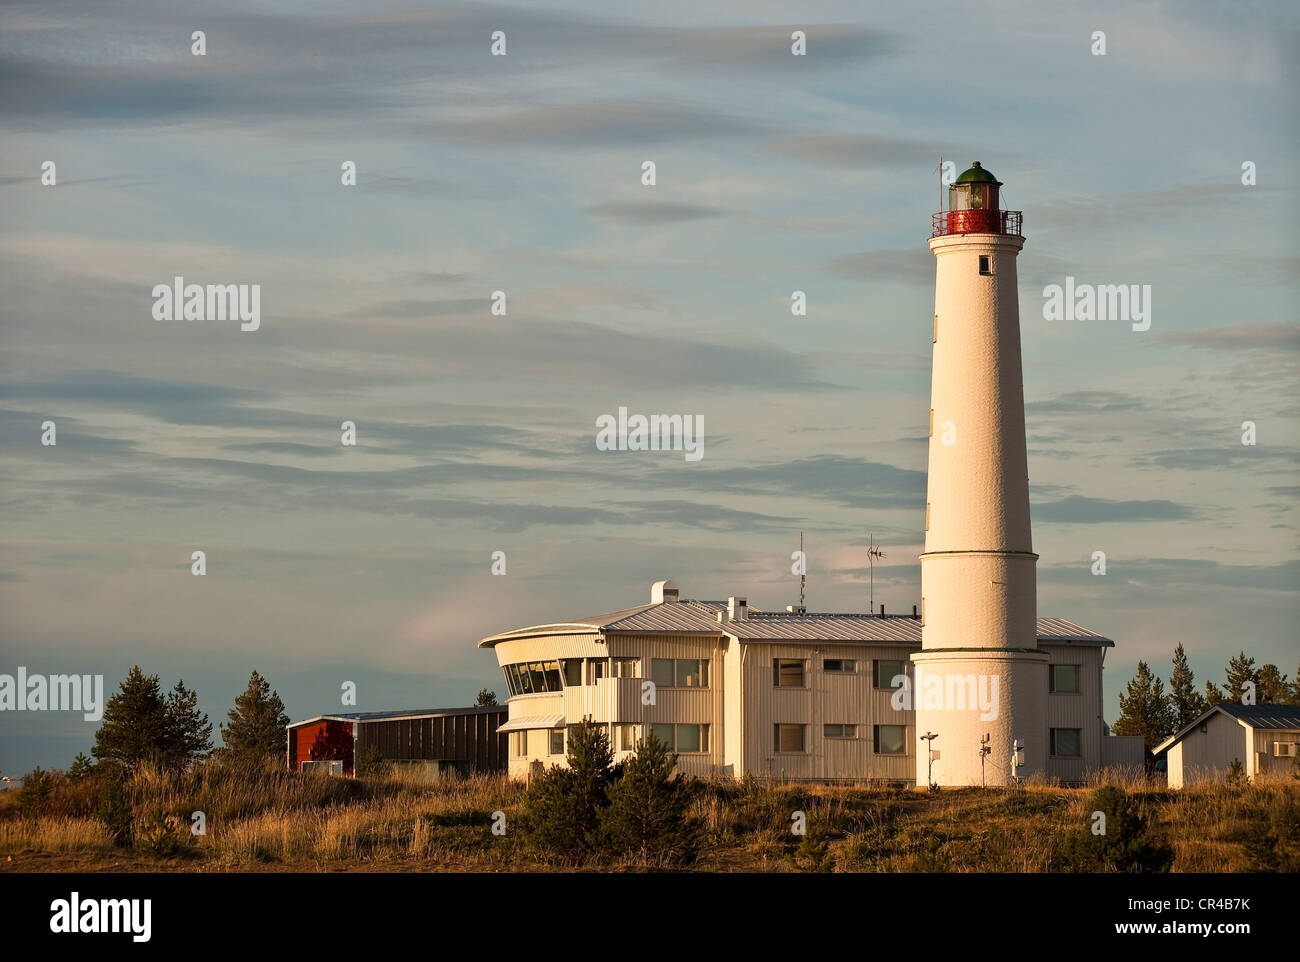 Finland, Gulf of Bothnia, Oulu Province, Hailuoto Island, lighthouse - Stock Image